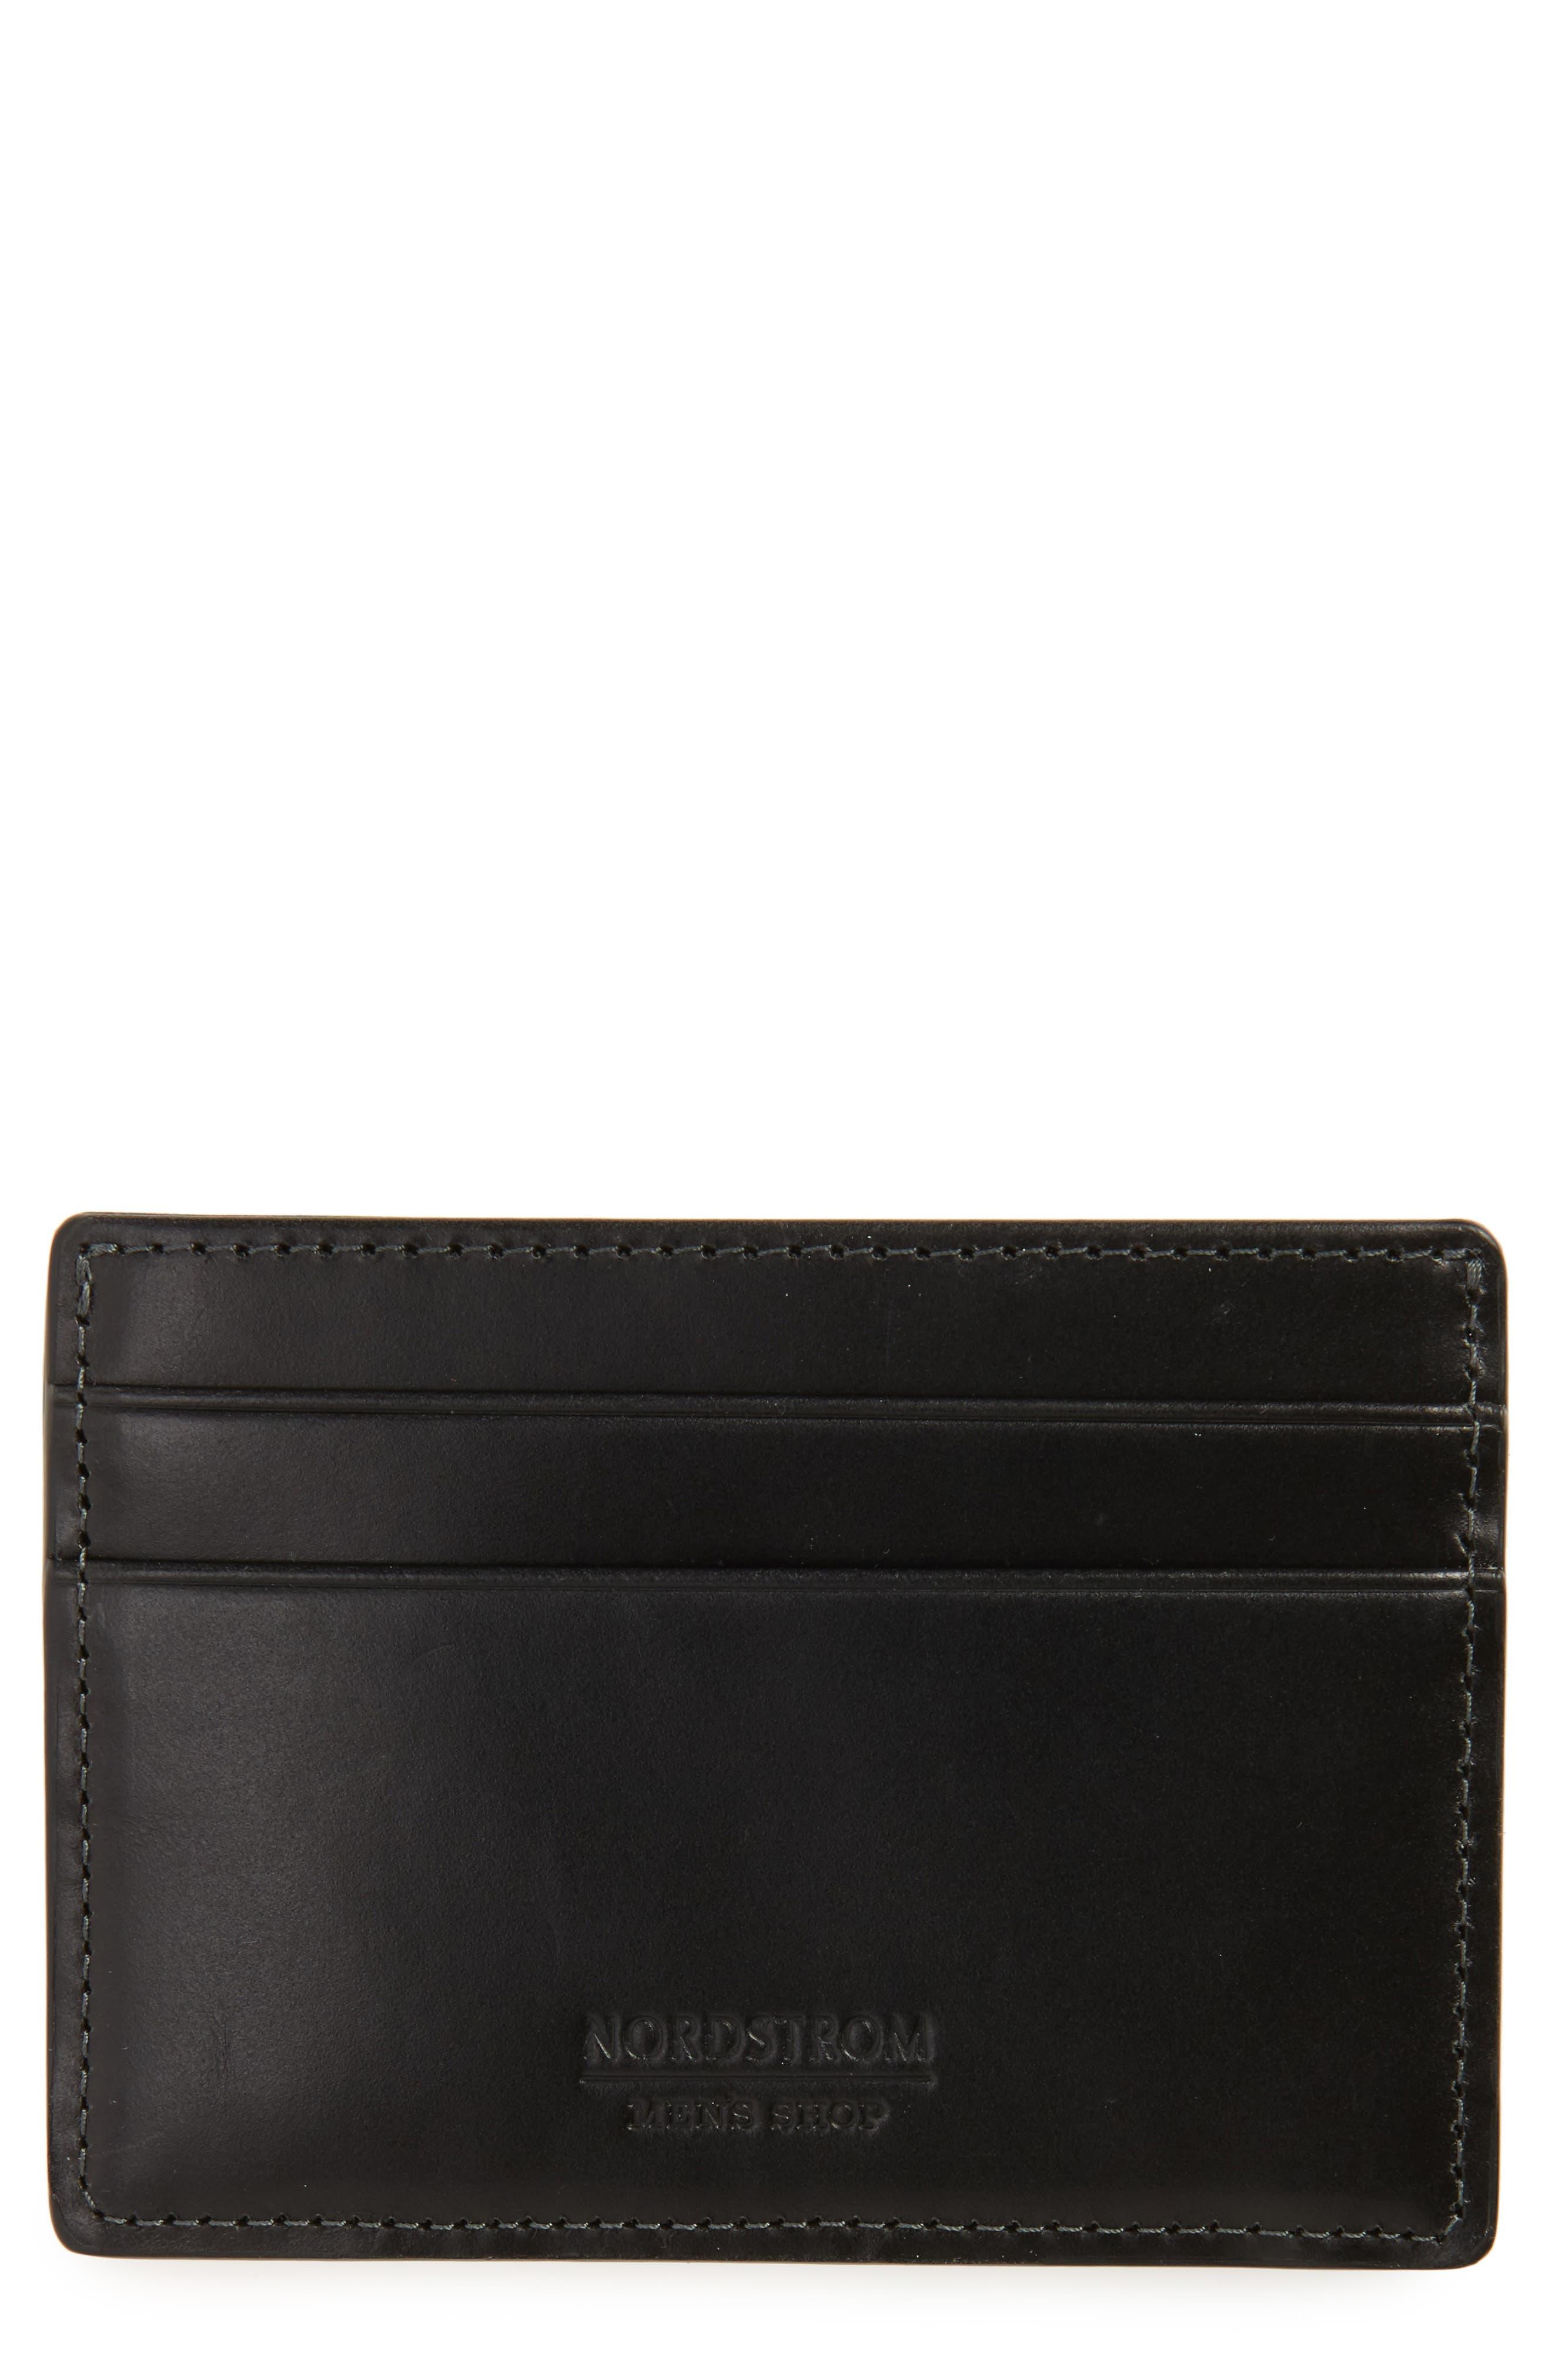 NORDSTROM MEN'S SHOP Wyatt RFID Card Case, Main, color, BLACK